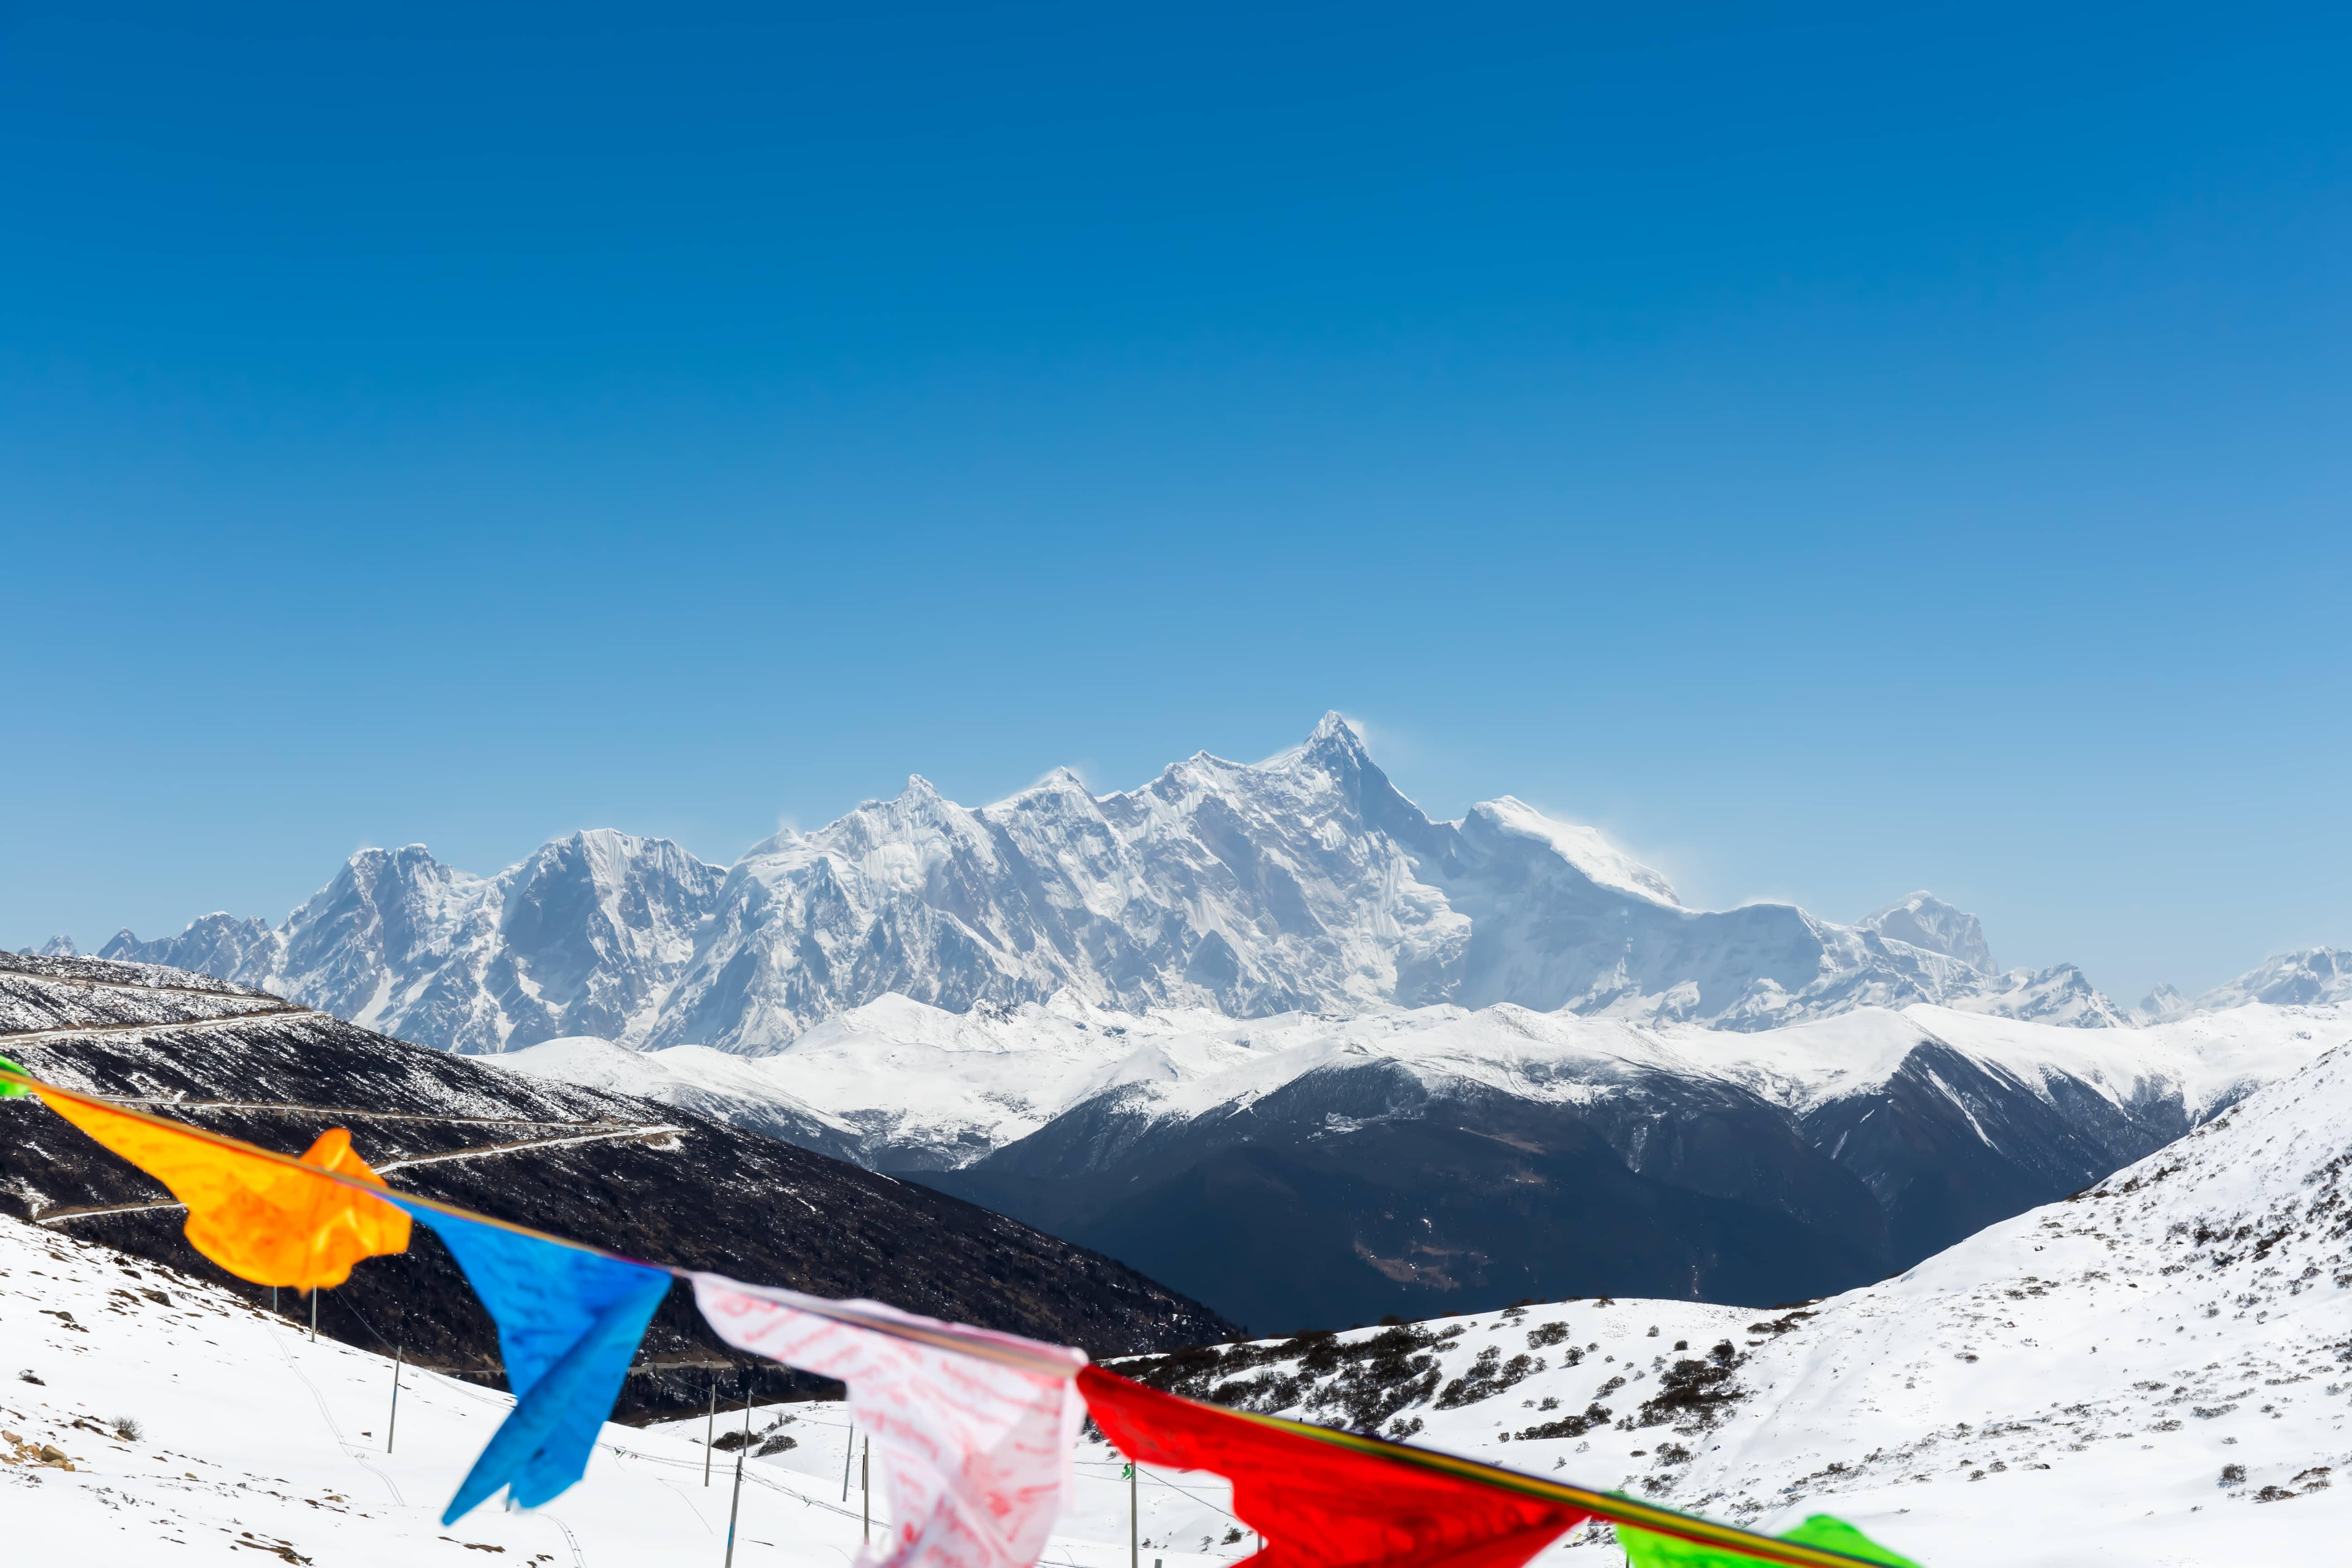 namcha barwa peak in tibet